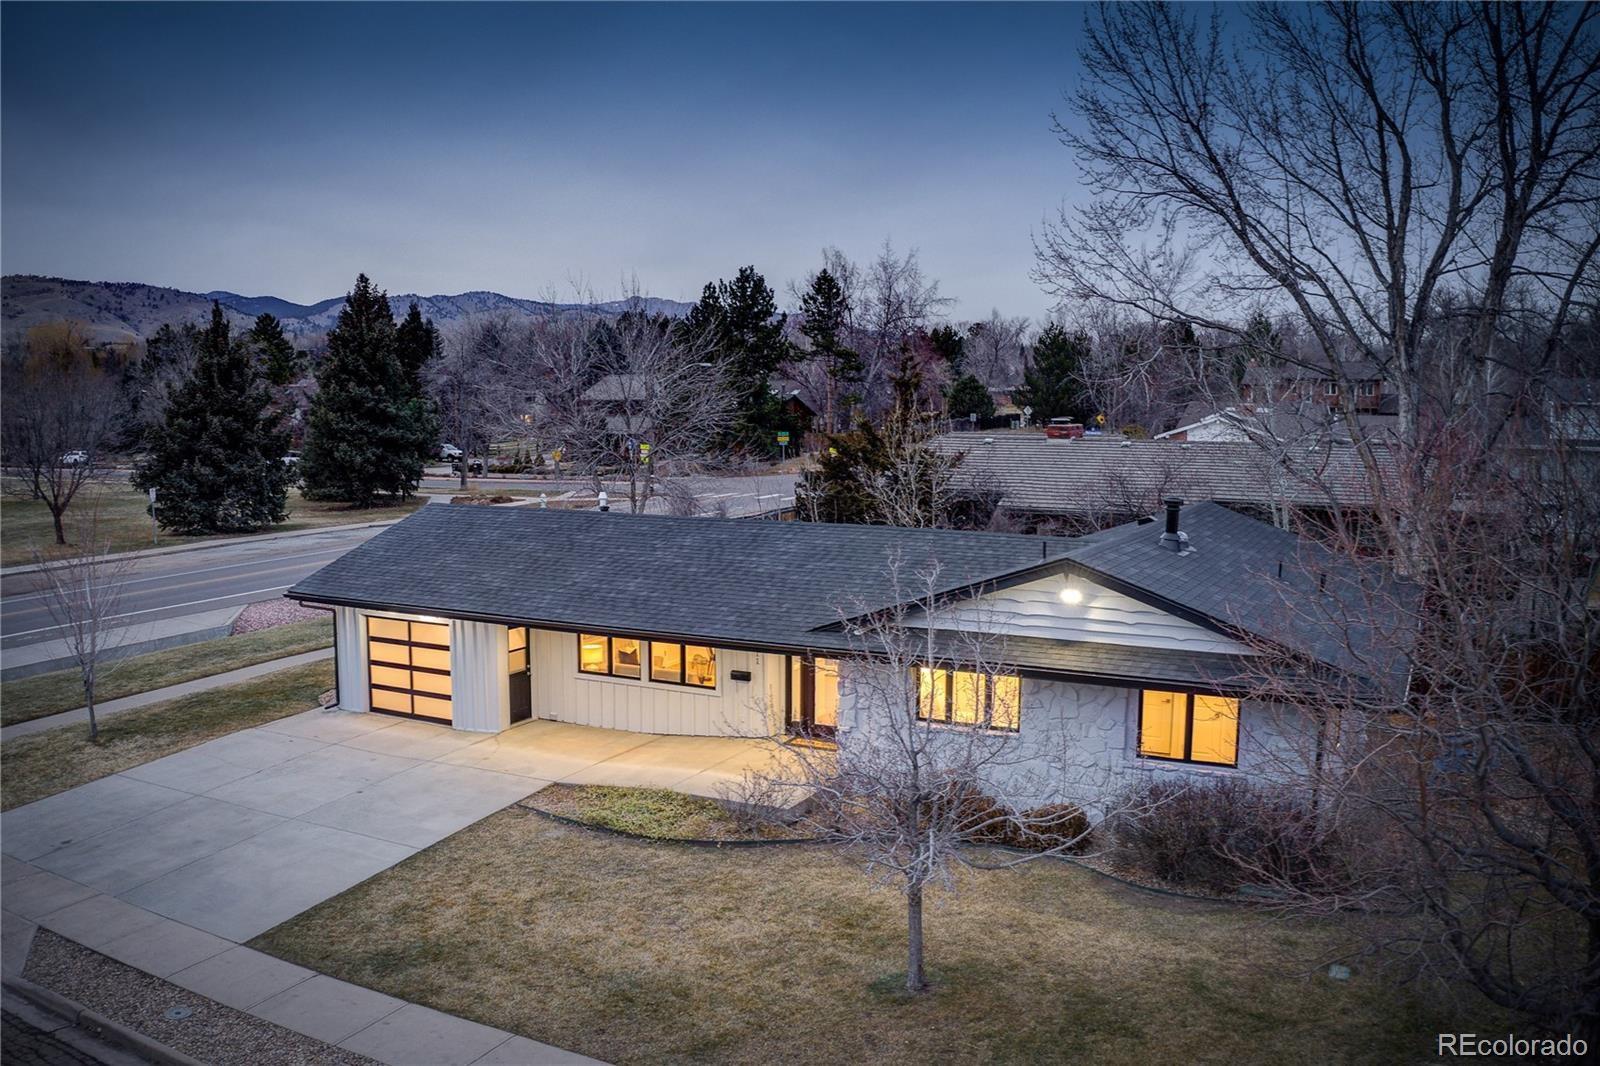 MLS# 2250282 - 23 - 2611 Lloyd Circle, Boulder, CO 80304